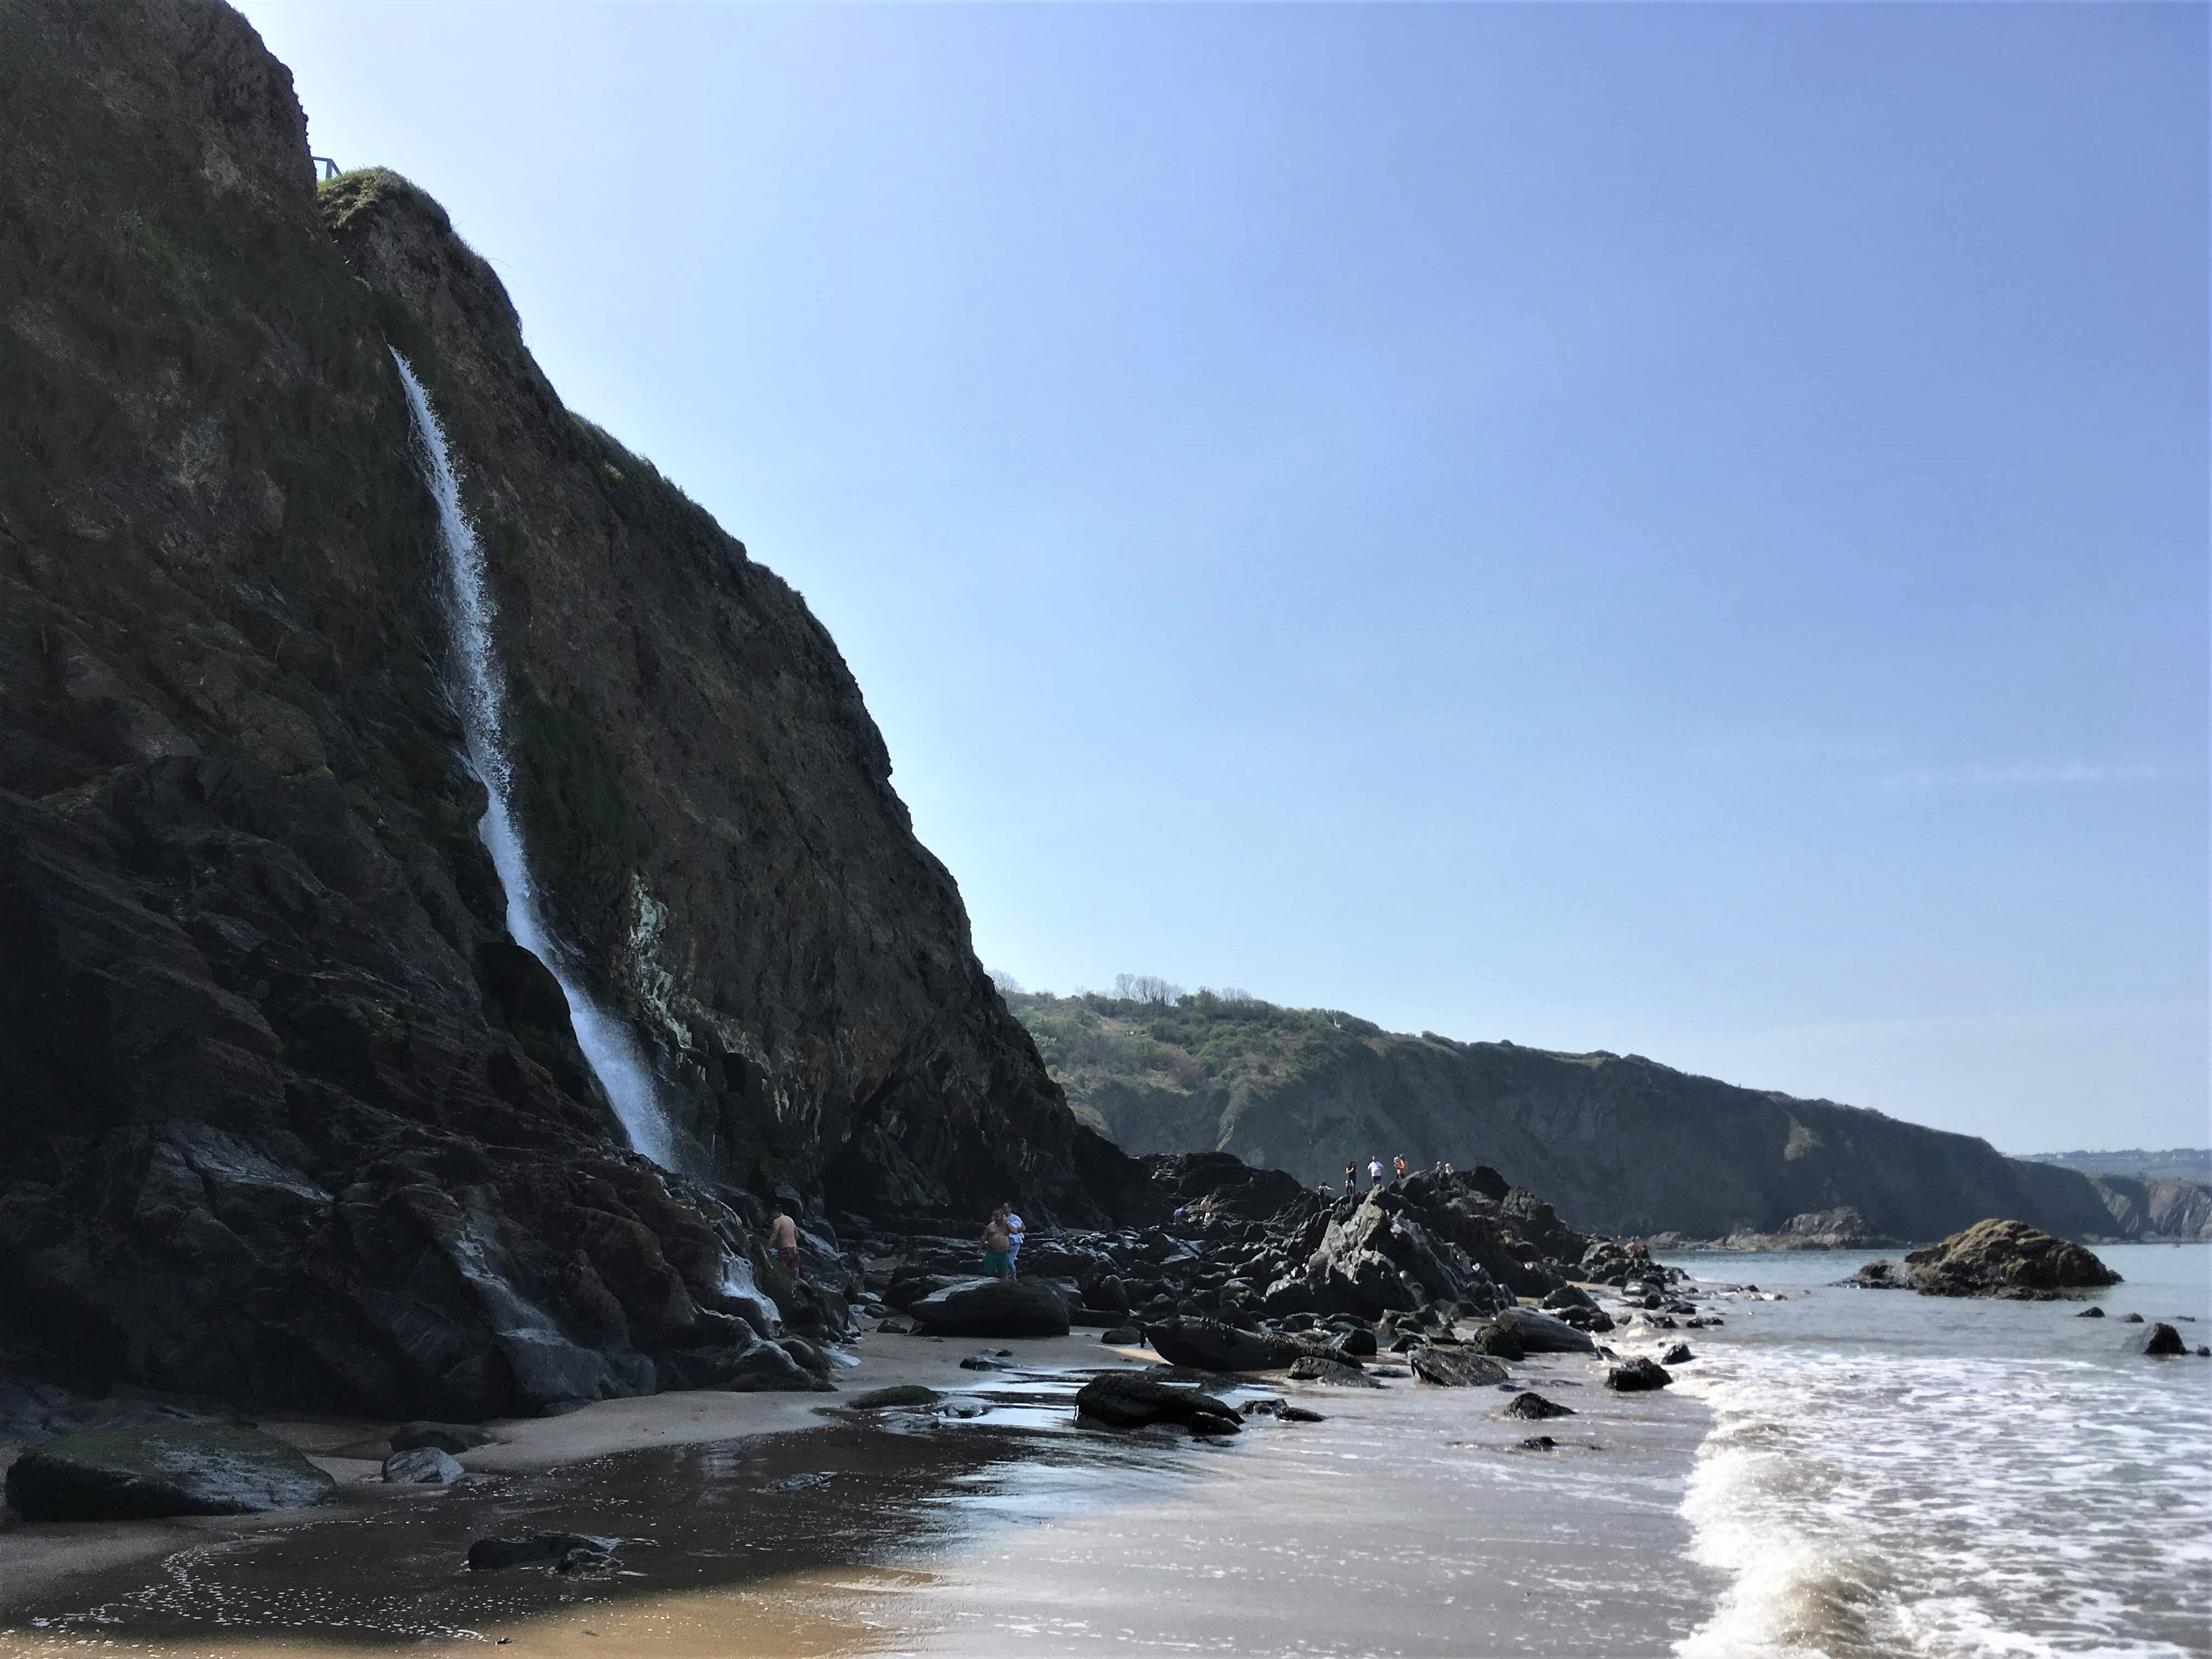 Tresaith Beach in Wales, UK